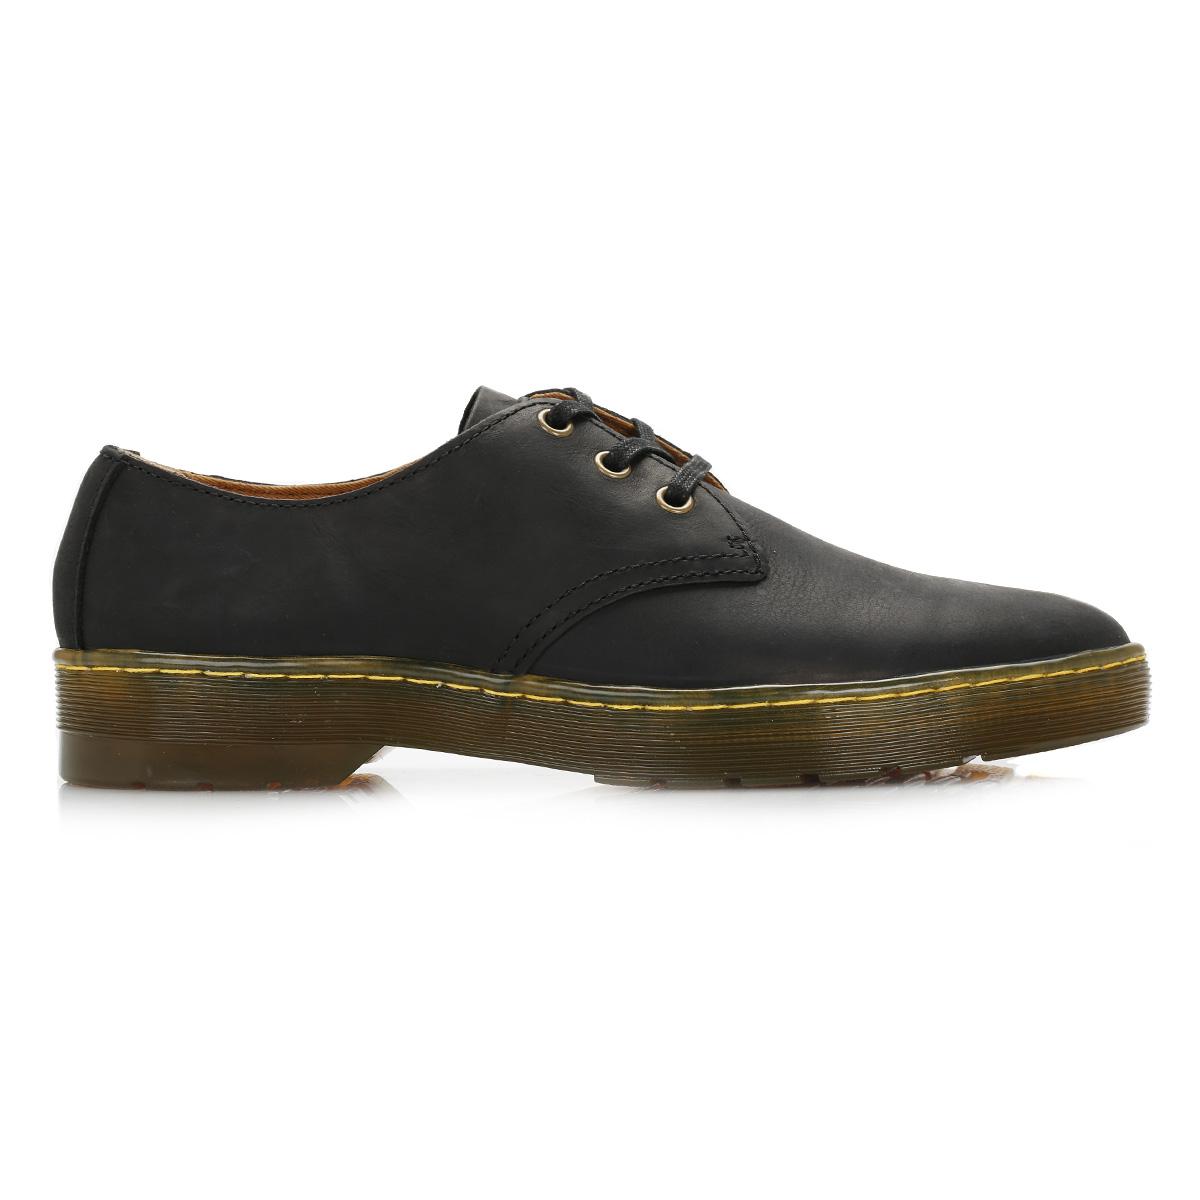 Dr. Martens Mens Casual Shoes Black Cruise Coronado ...